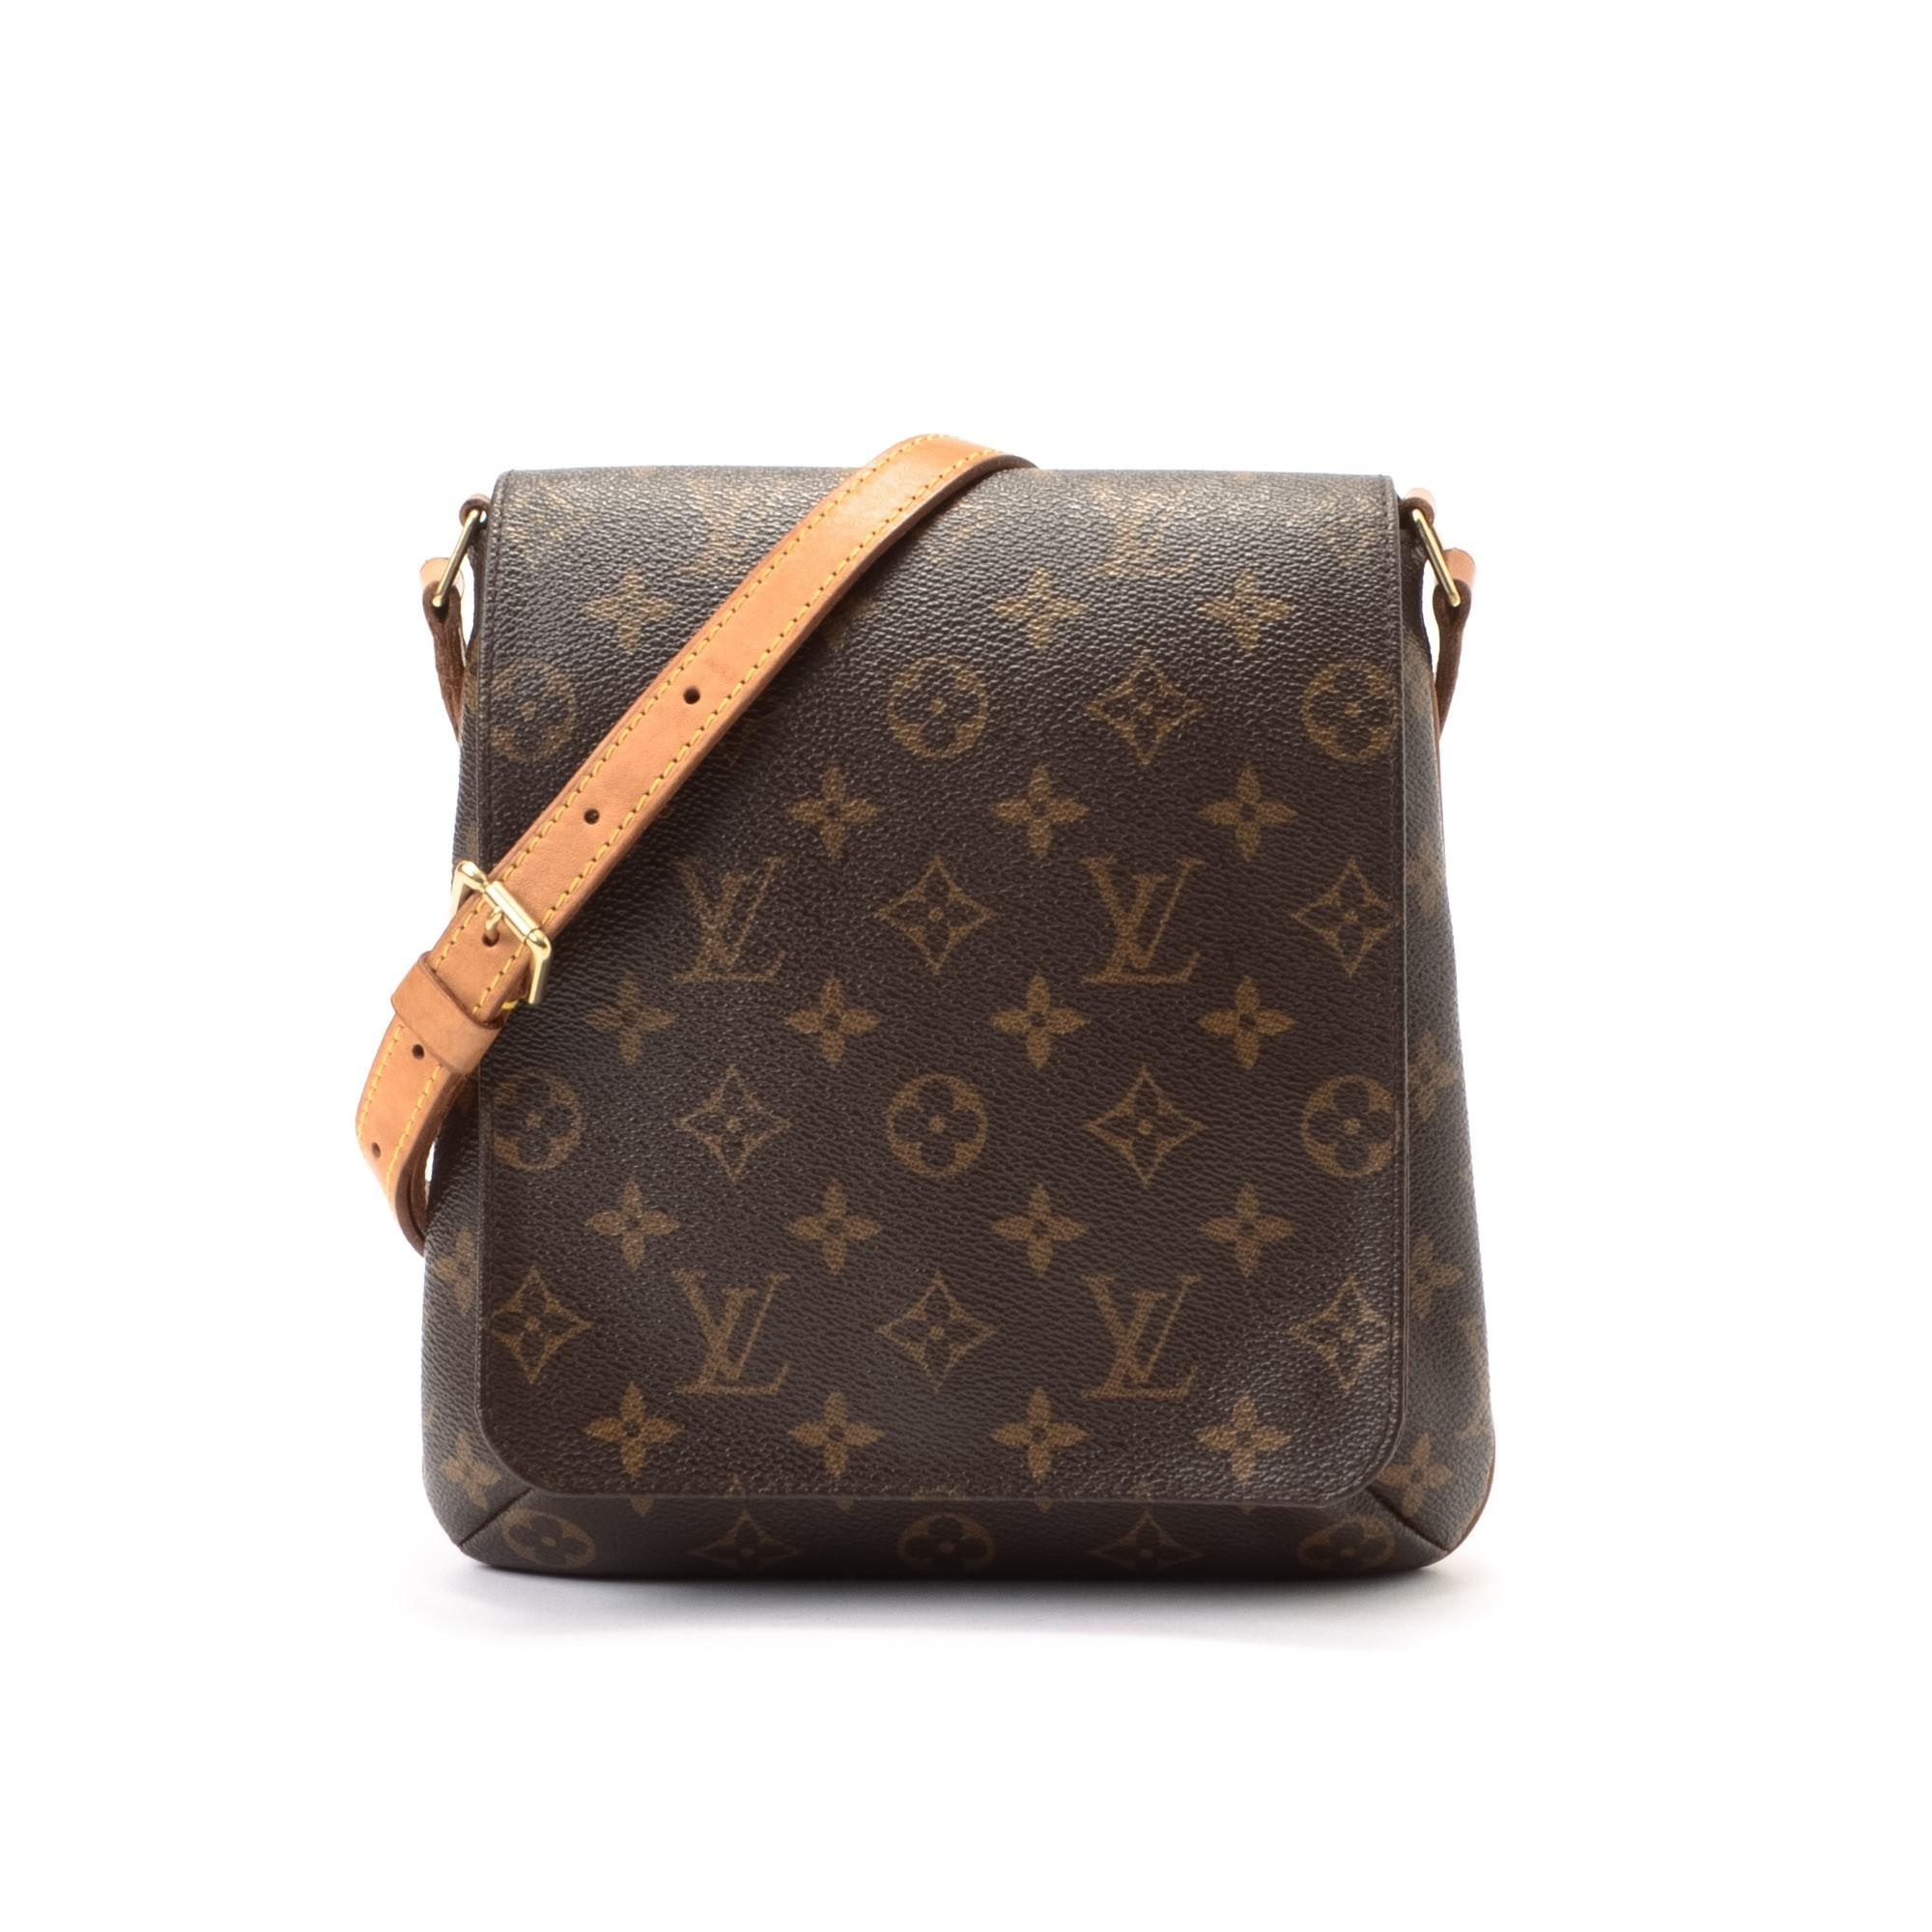 Innovative Eva Monogram Canvas In Women39s Handbags Collections By Louis Vuitton